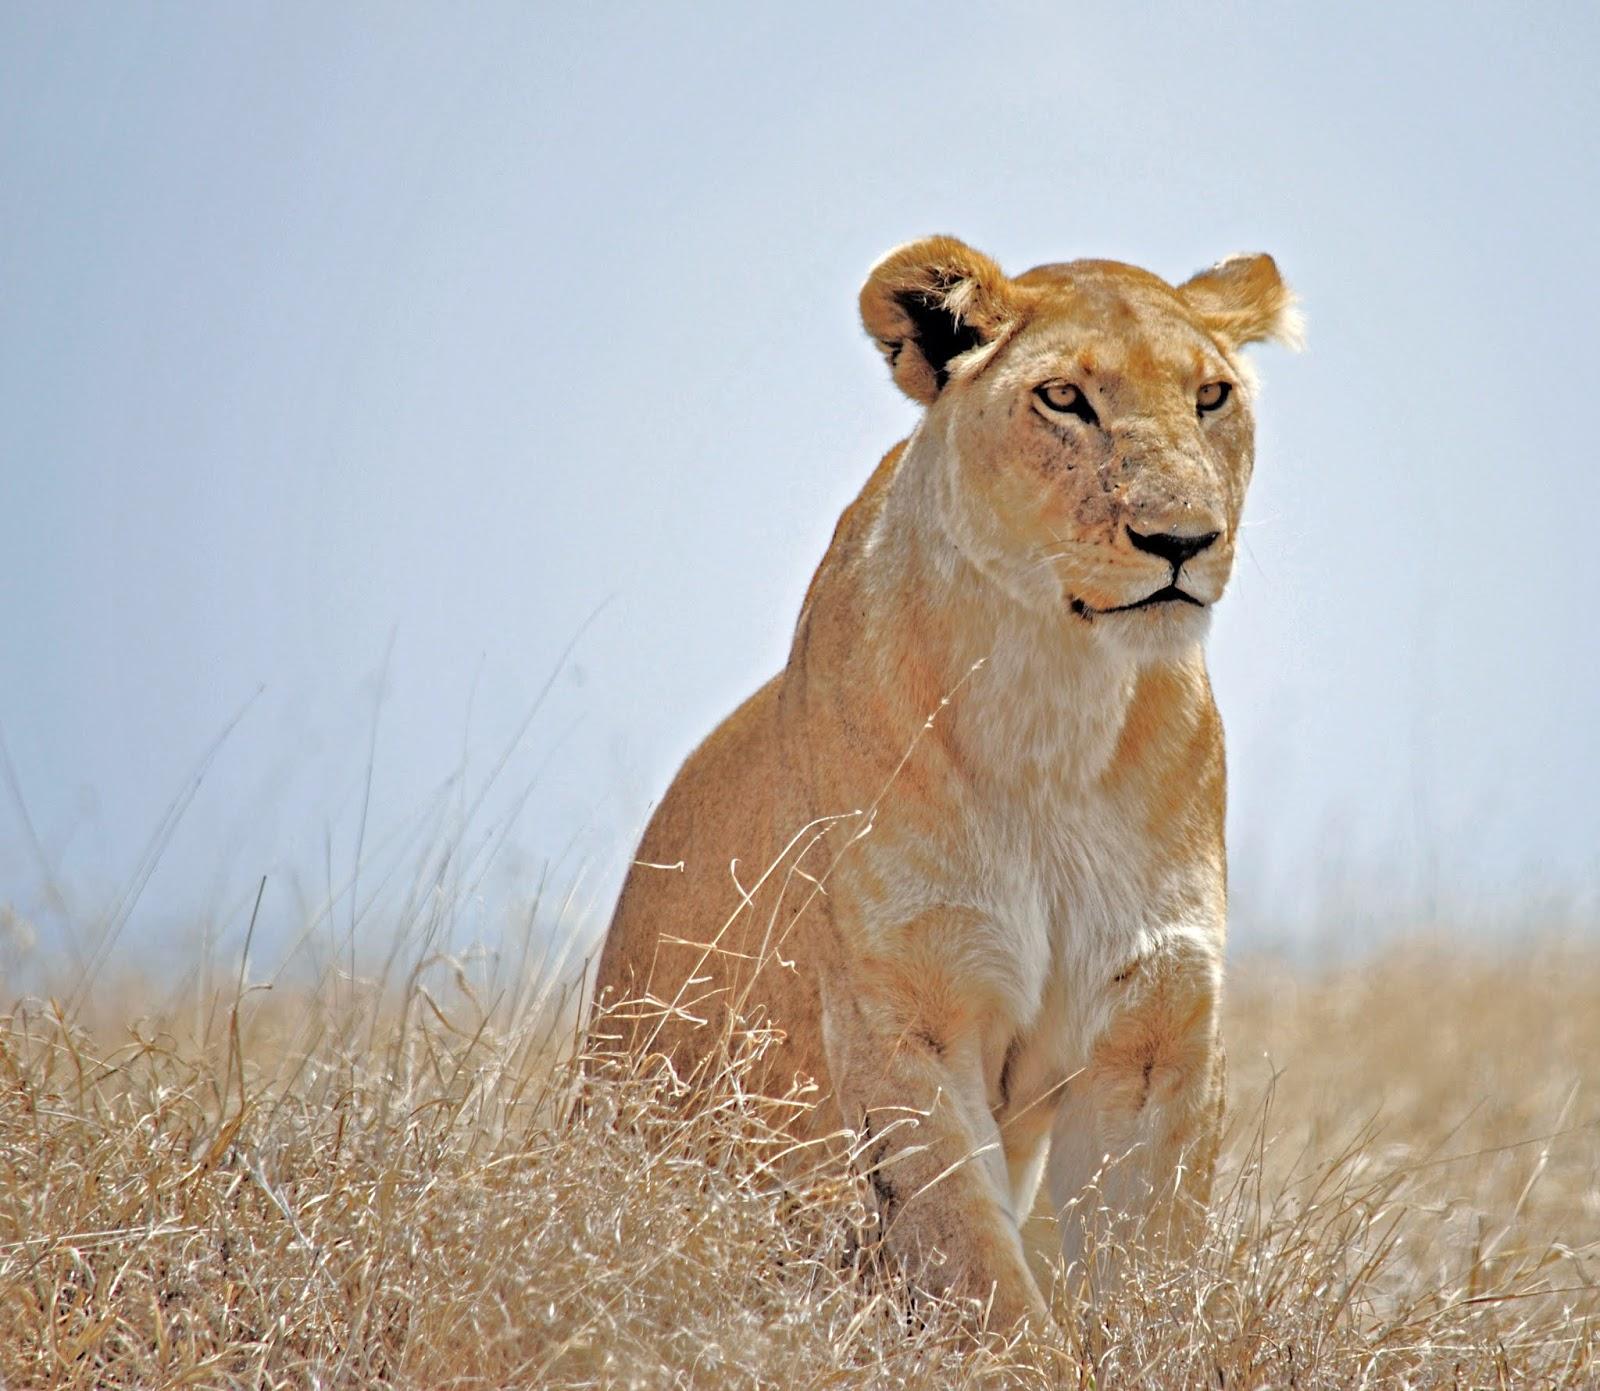 Lioness on the hunt,lion images